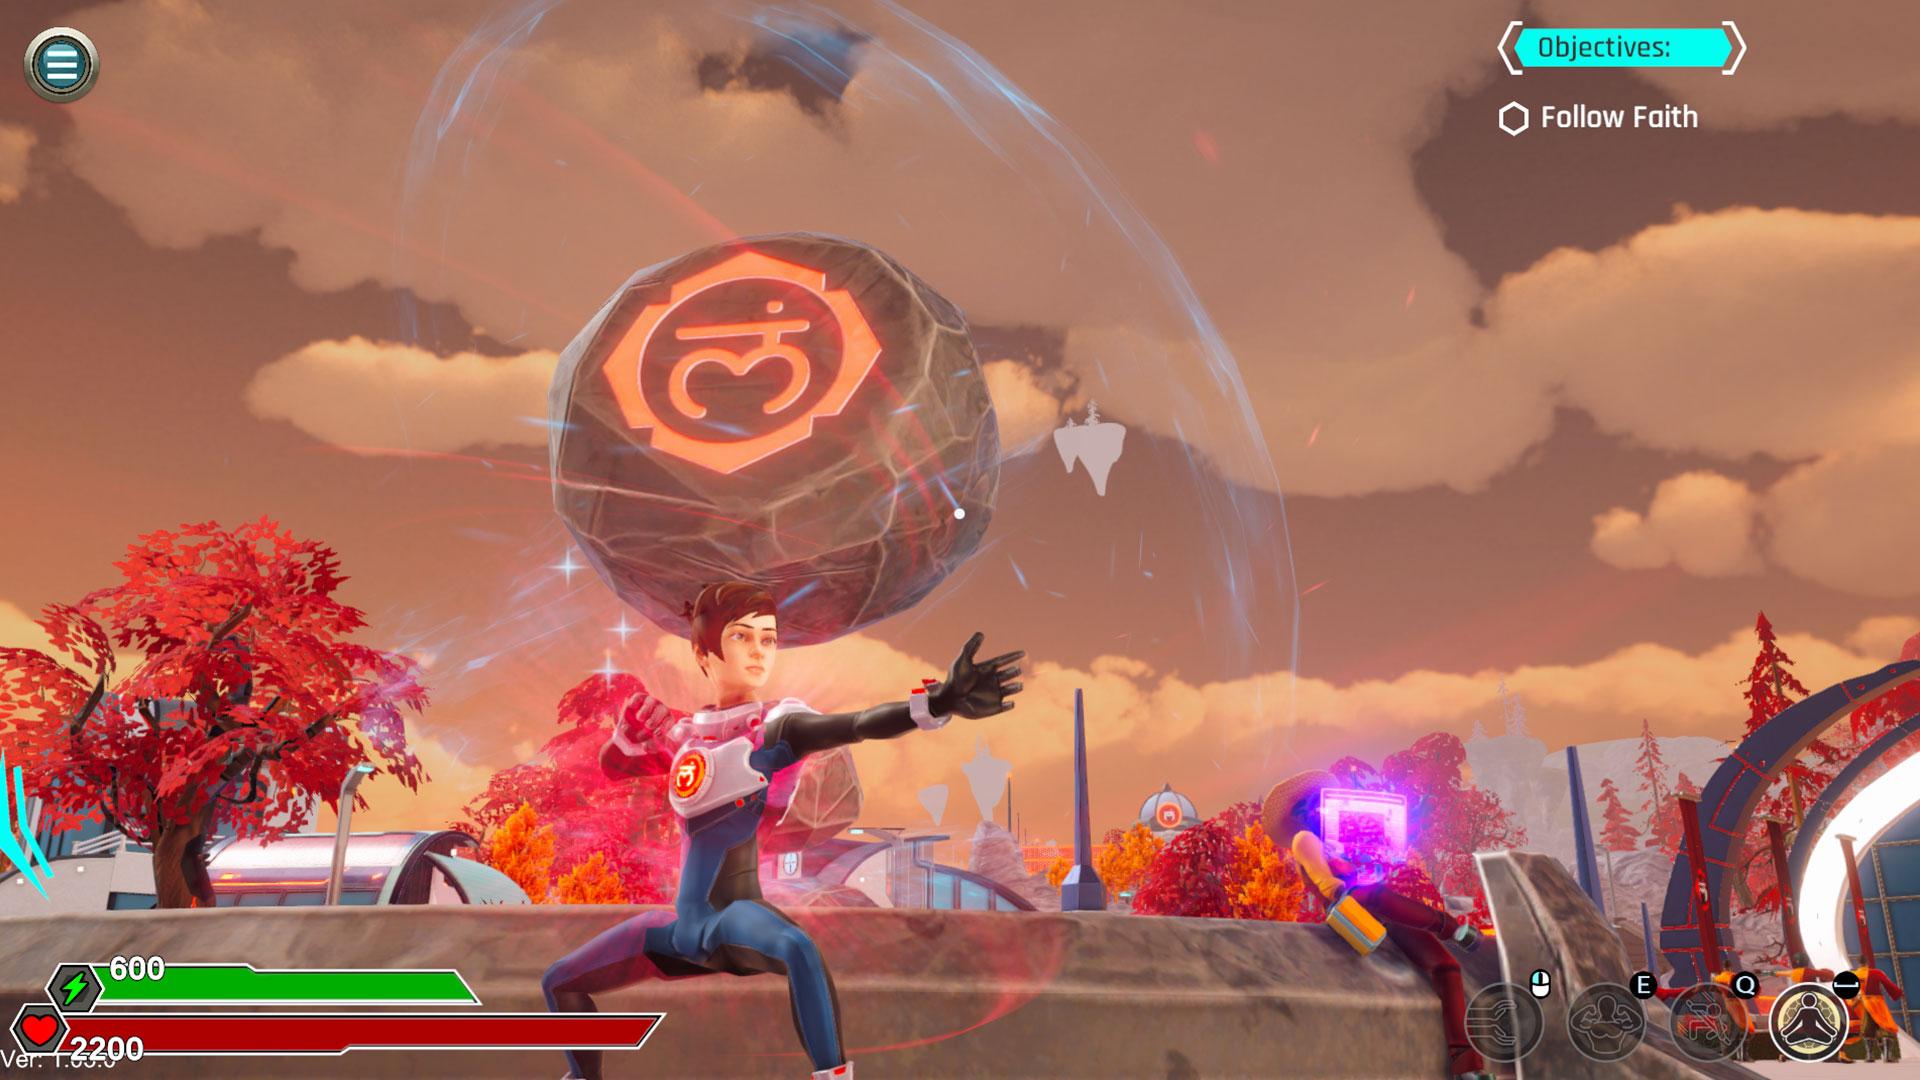 Sci-Fi Action-Adventure Game teaches kids values